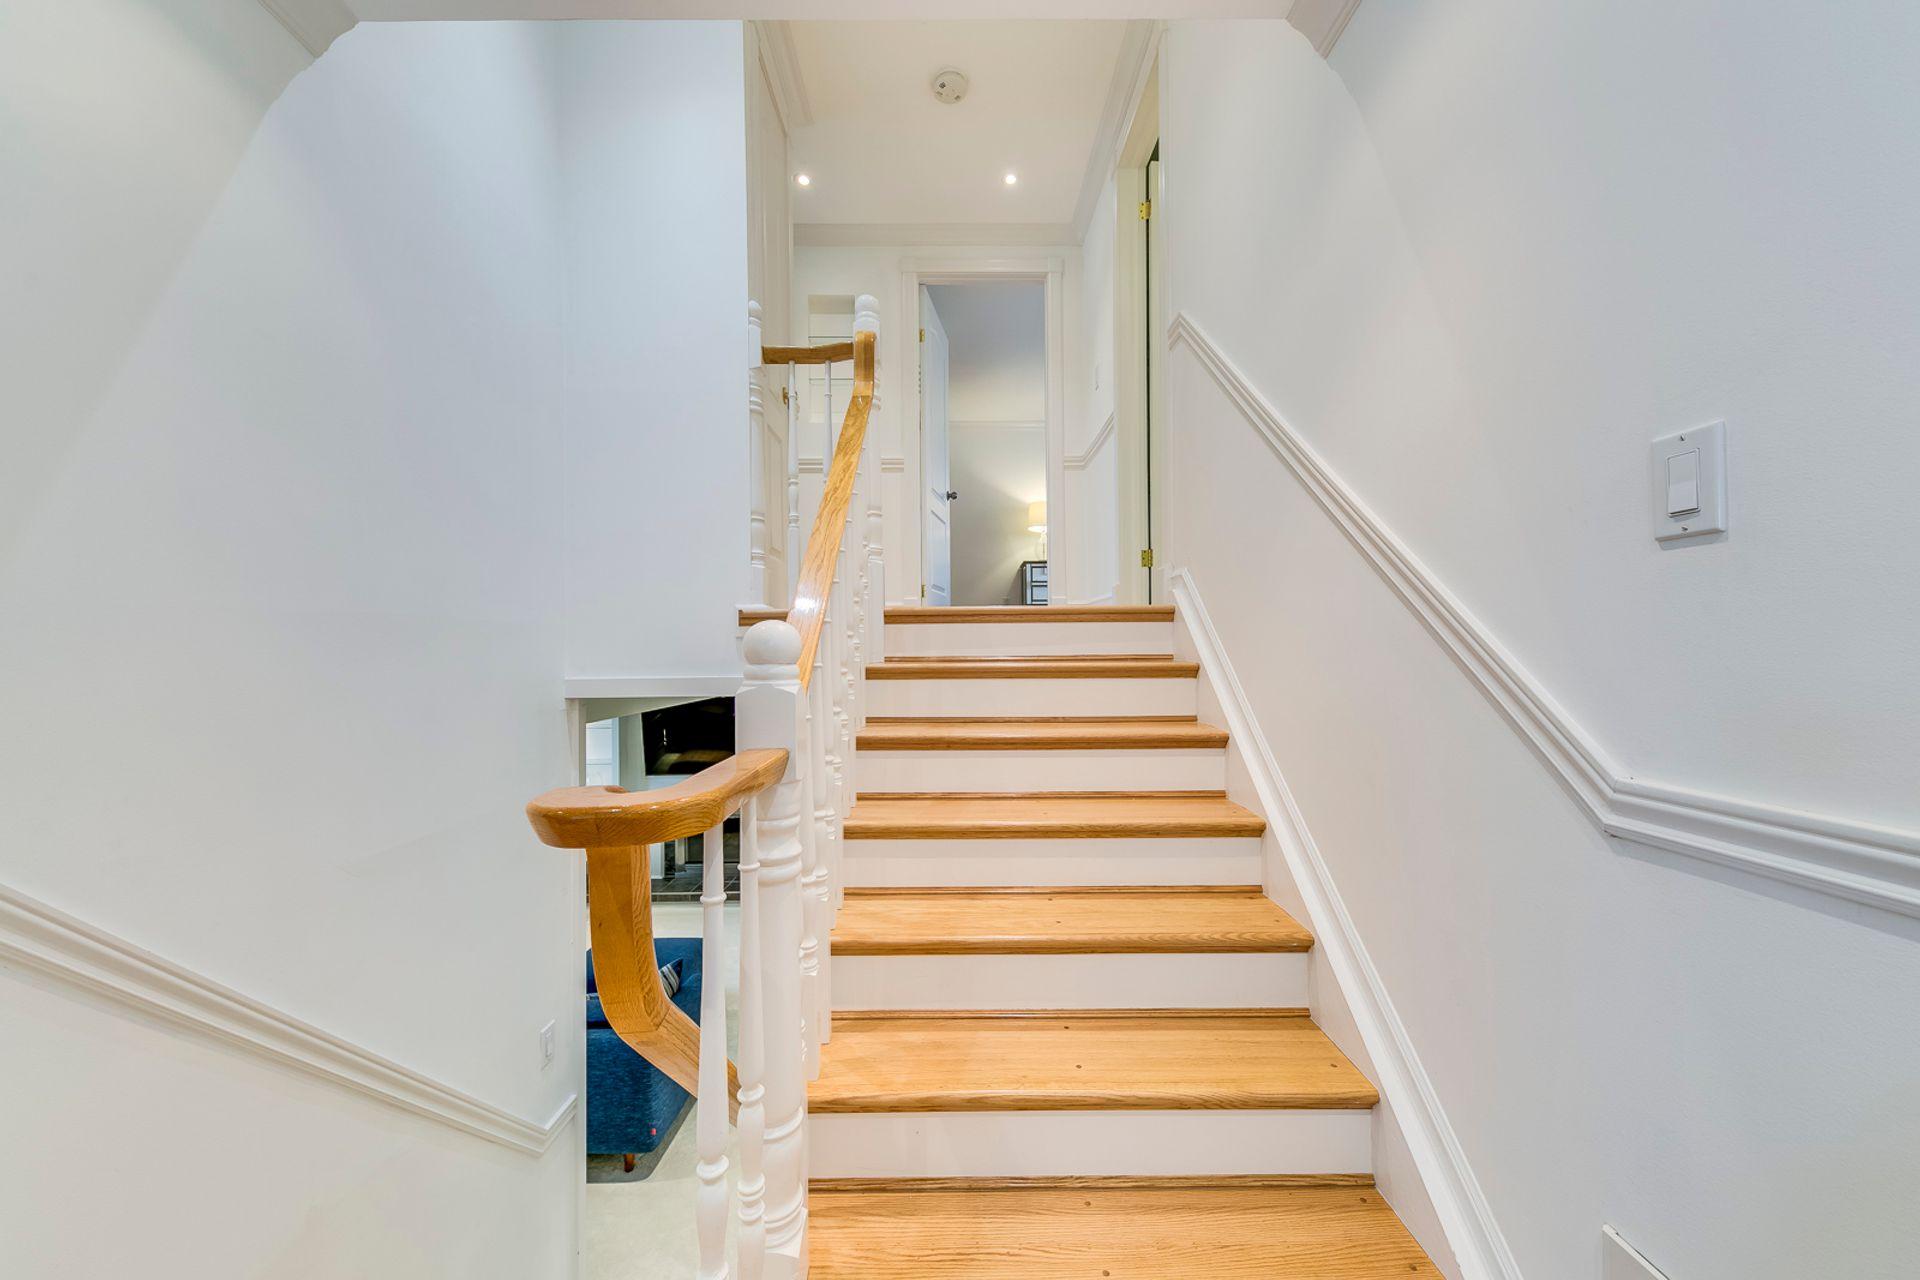 Stairs - 2129 Constance Dr, Oakville - Elite3 & Team at 2129 Constance Drive, Eastlake, Oakville